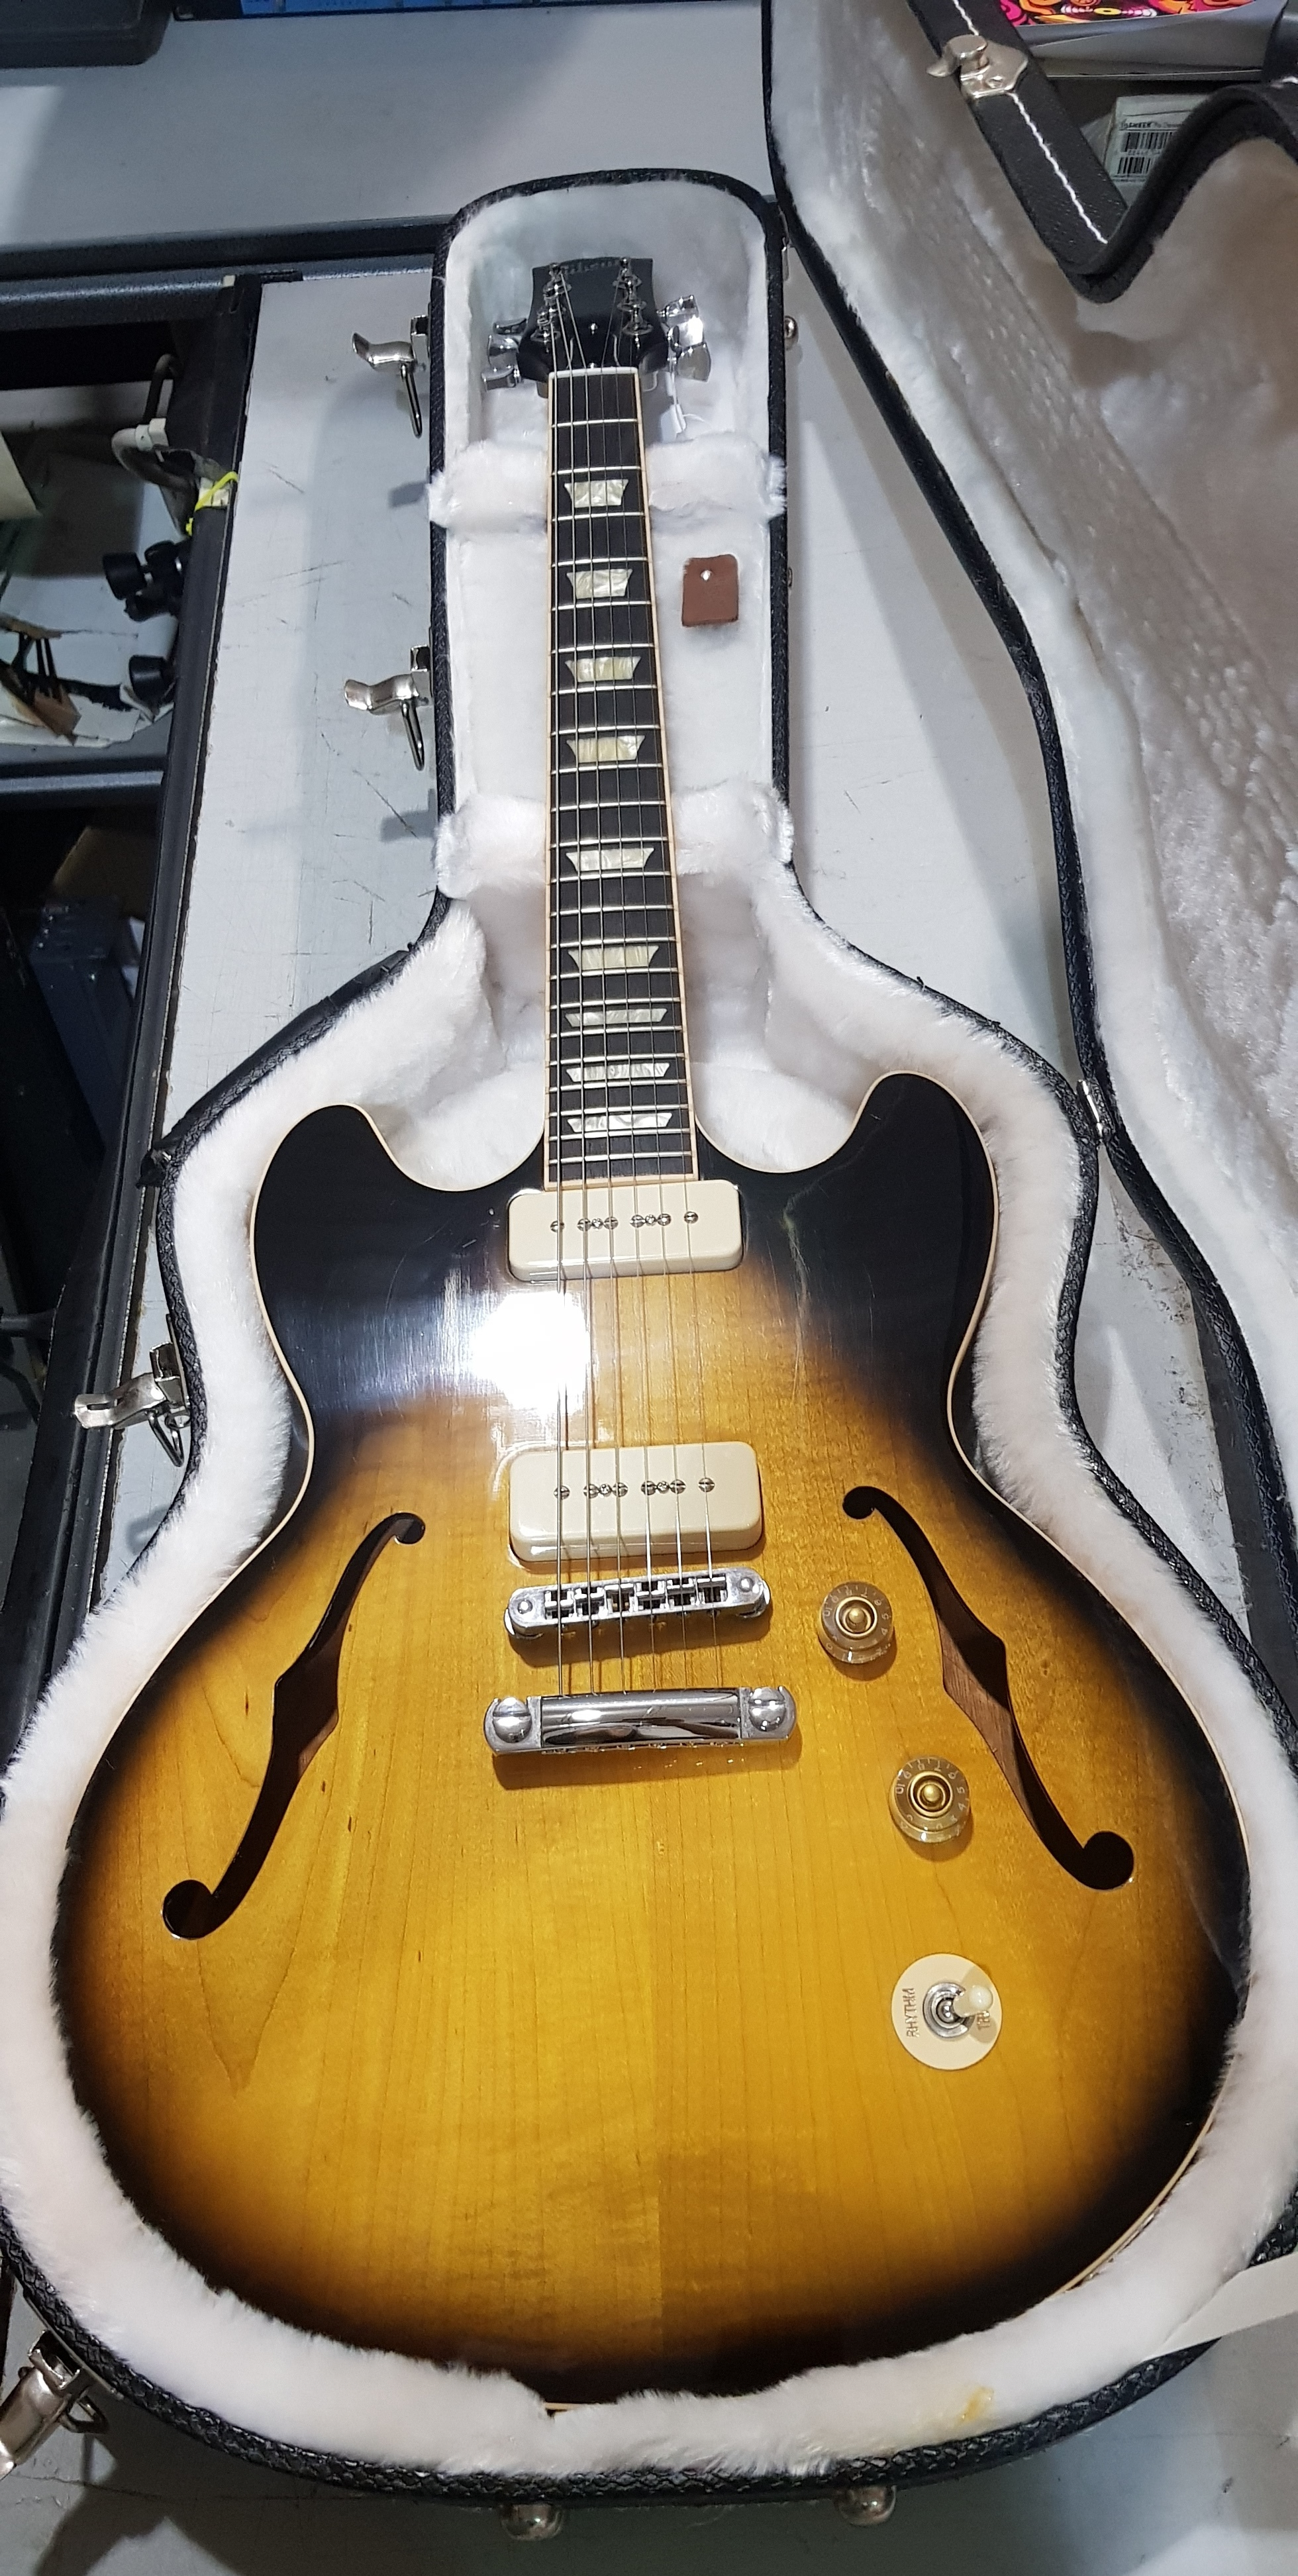 2012 GIBSON USA MIDTOWN Semi-Hollowbody Electric Guitar **HSC** Tobacco Sunburst